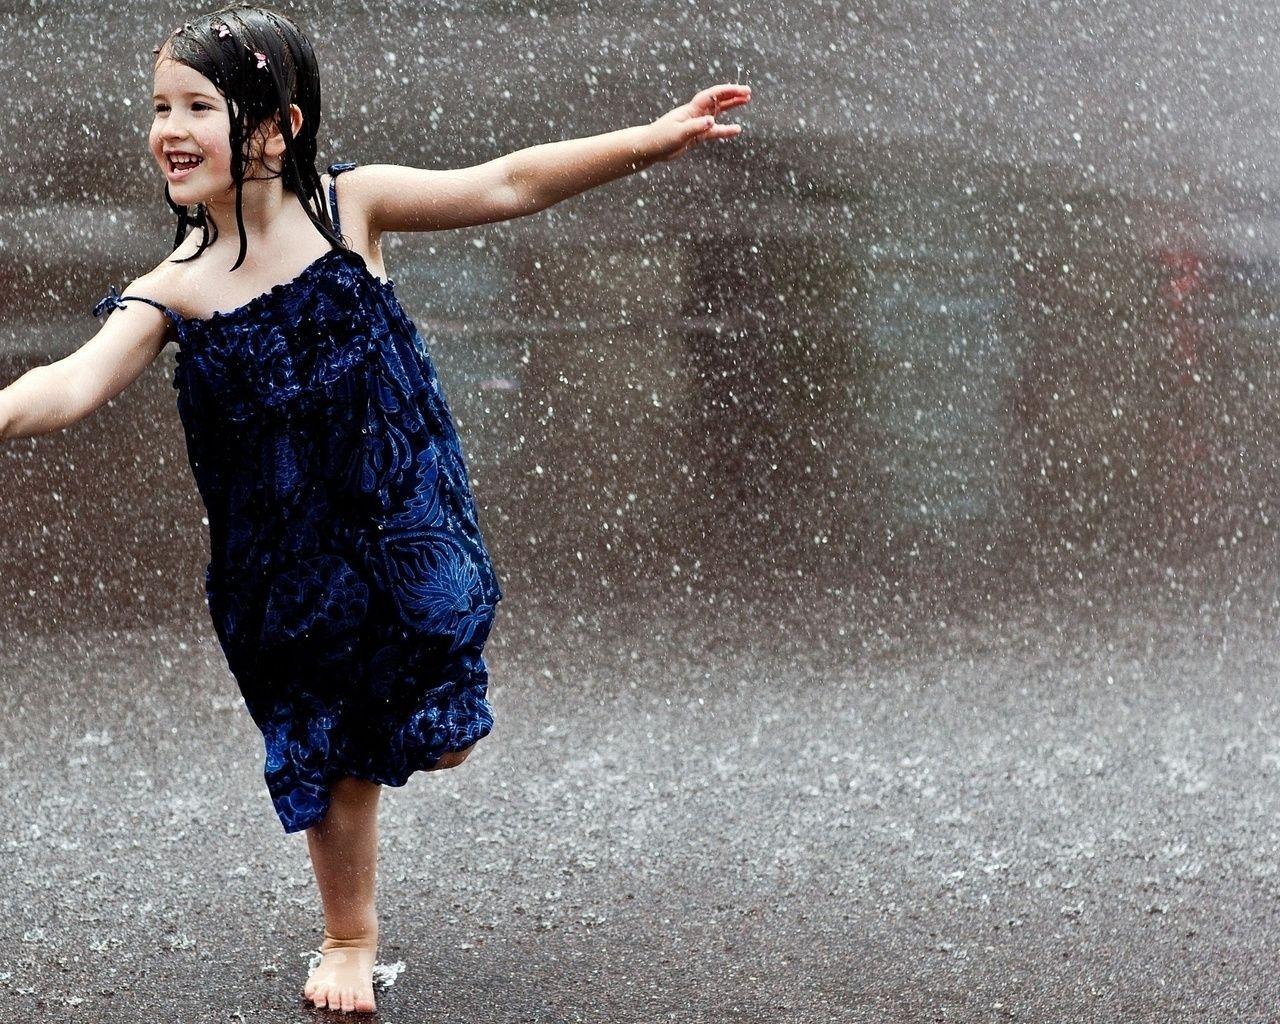 #rain  #wallpapers via http://www.wallsave.com